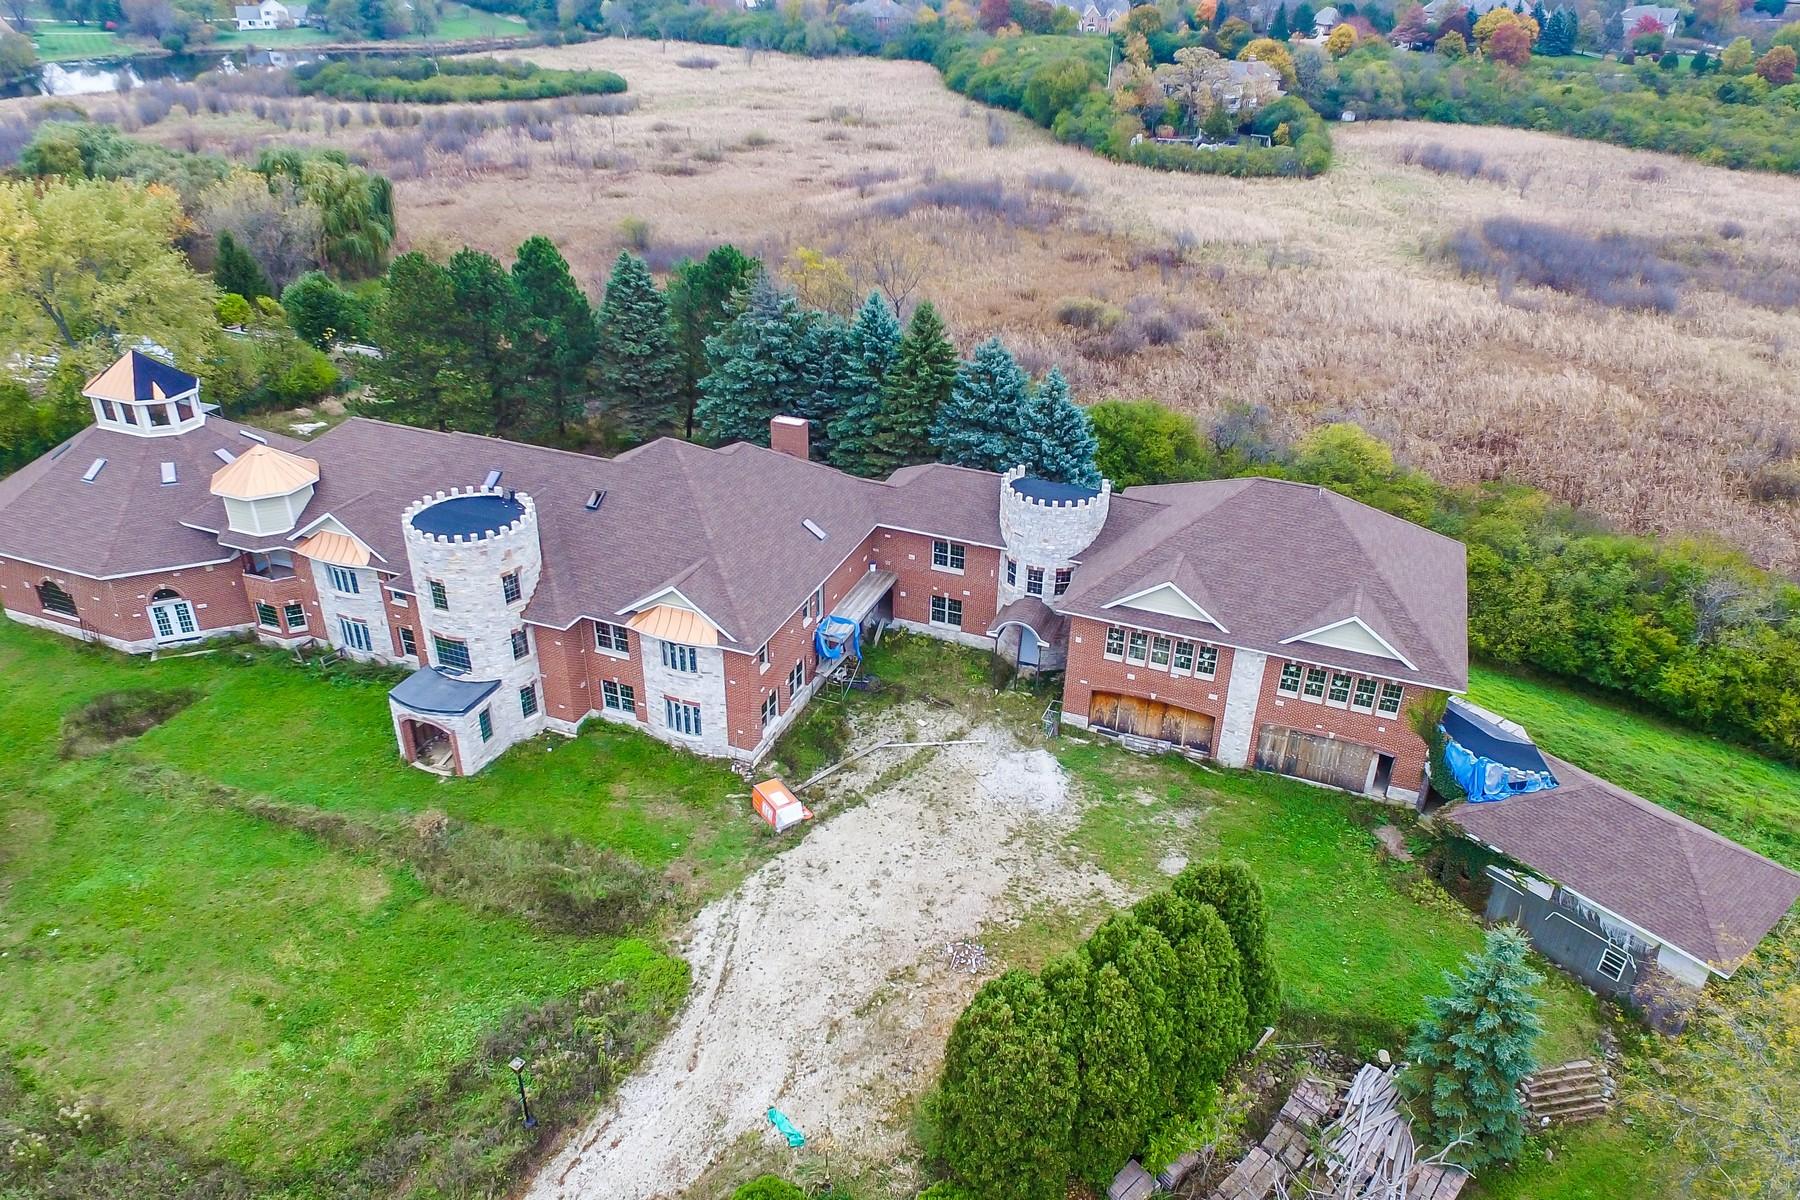 獨棟家庭住宅 為 出售 在 Eight Bedroom Stunning Barrington Estate 24575 N Illinois Route 59 Road Barrington, 伊利諾斯州, 60010 美國